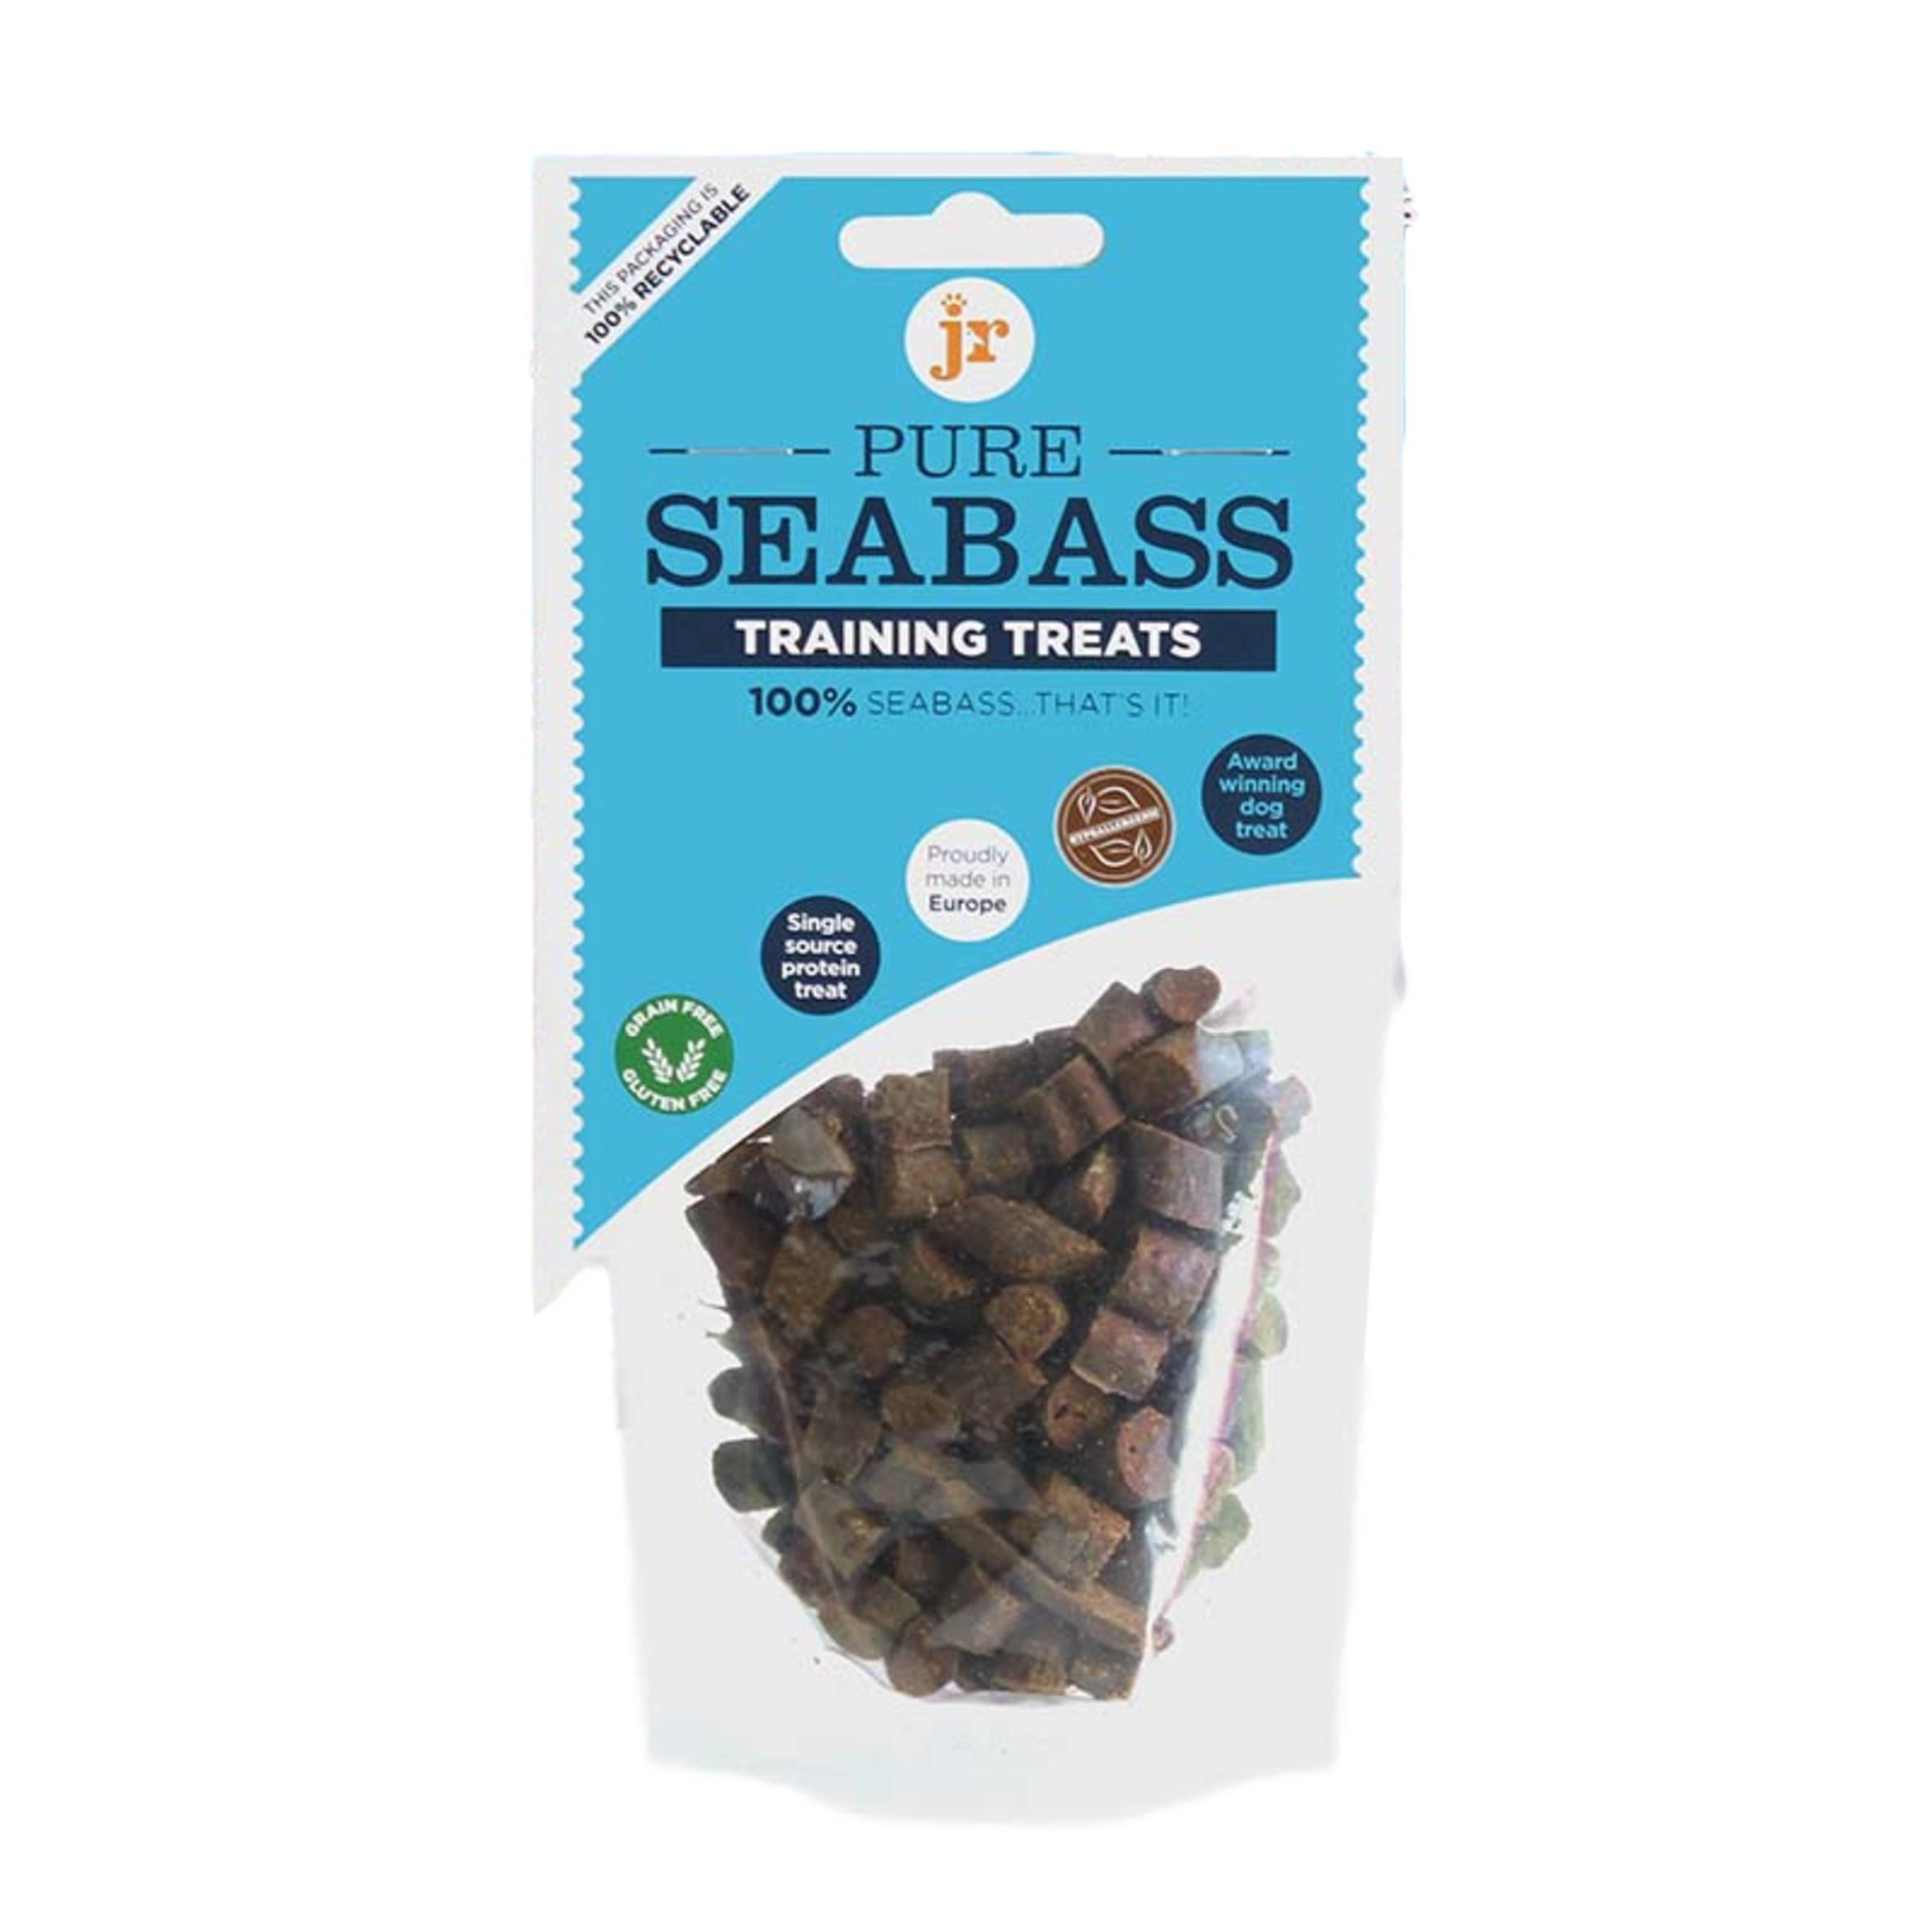 JR Pure Seabass Training Treats 85gm